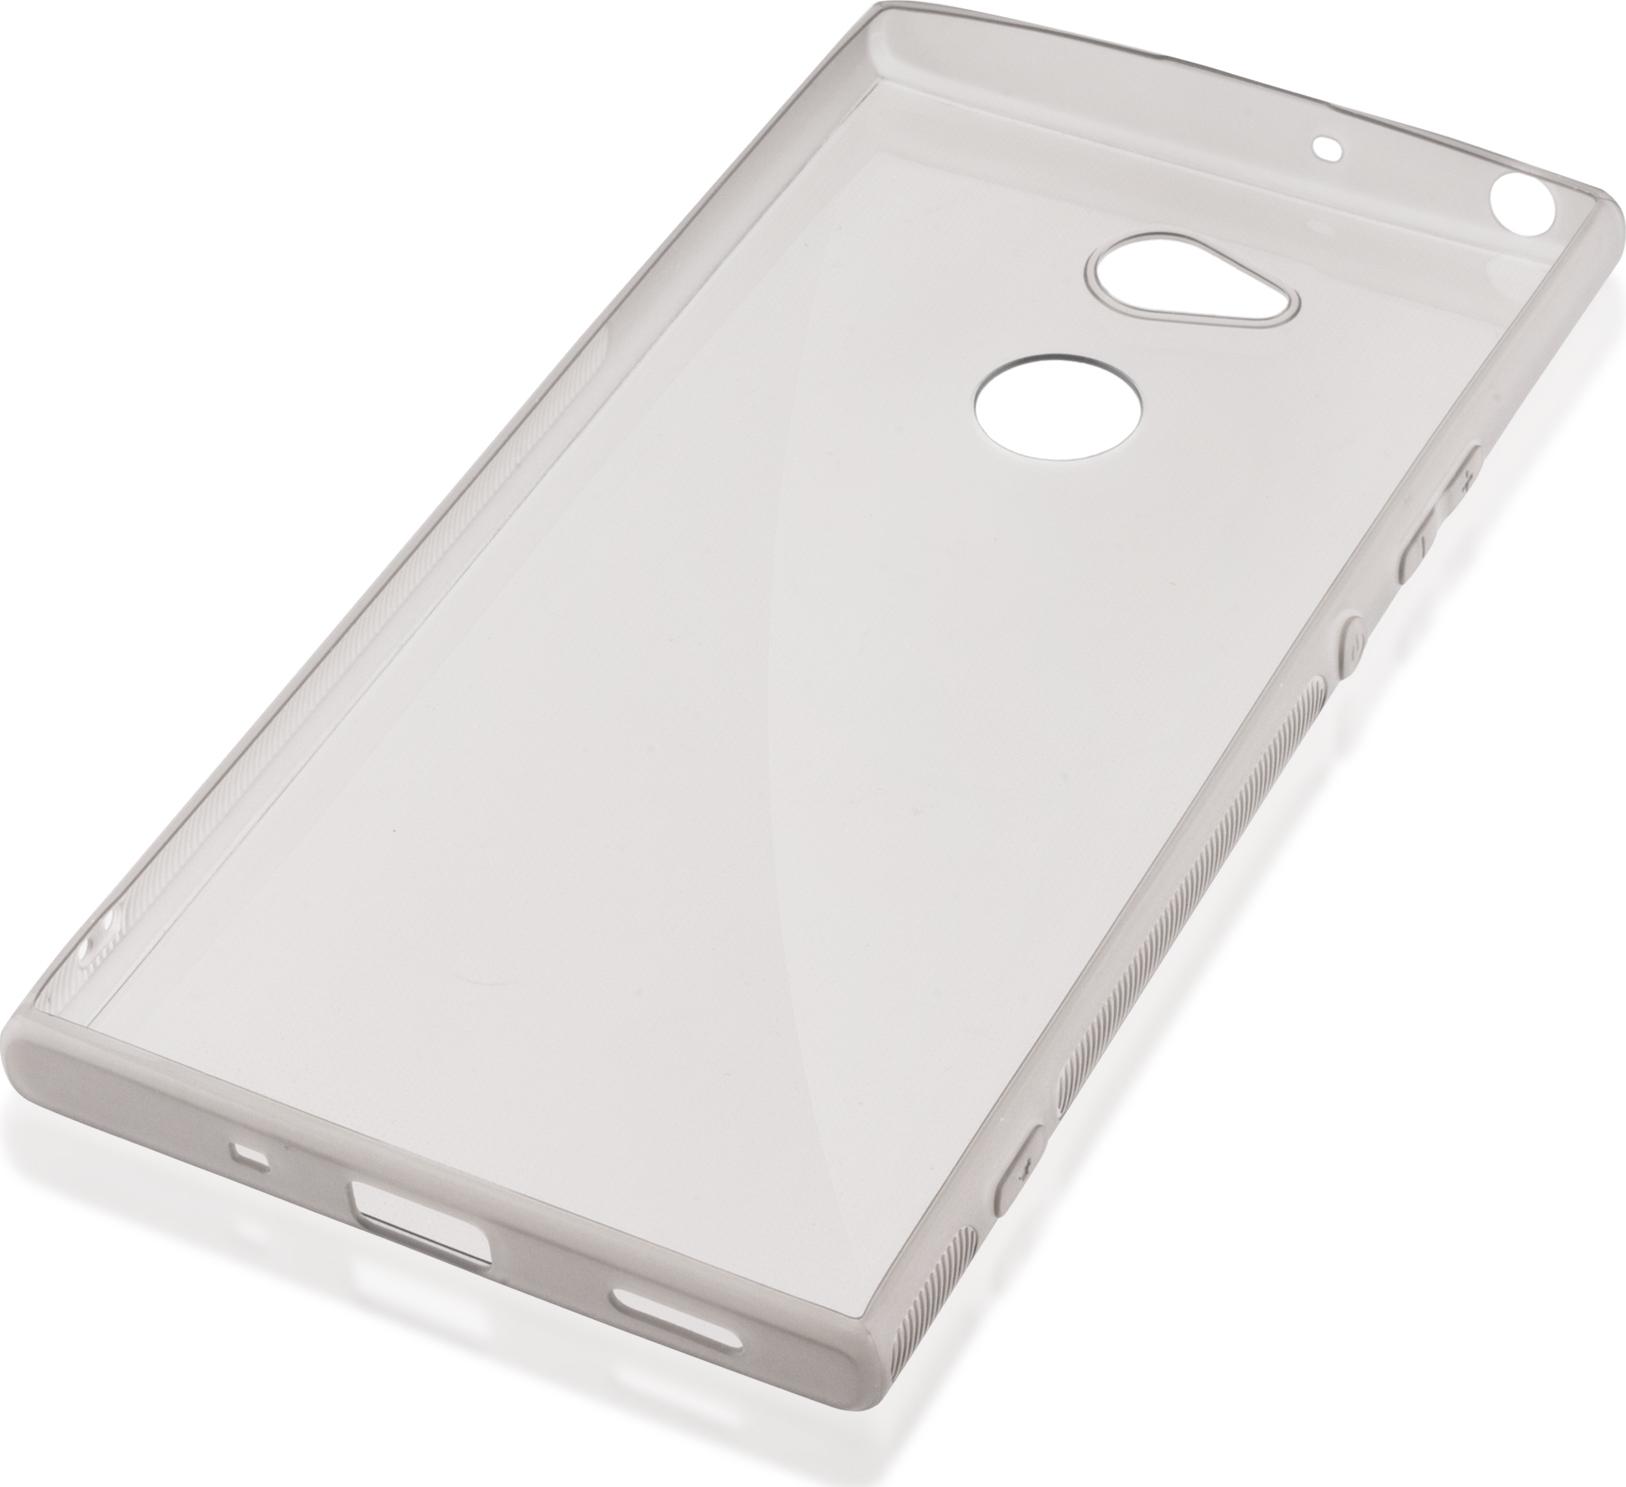 Чехол Brosco New TPU для Sony Xperia XA2 Ultra, черный чехол для сотового телефона brosco для sony xa2 ultra xa2u book gold золотой